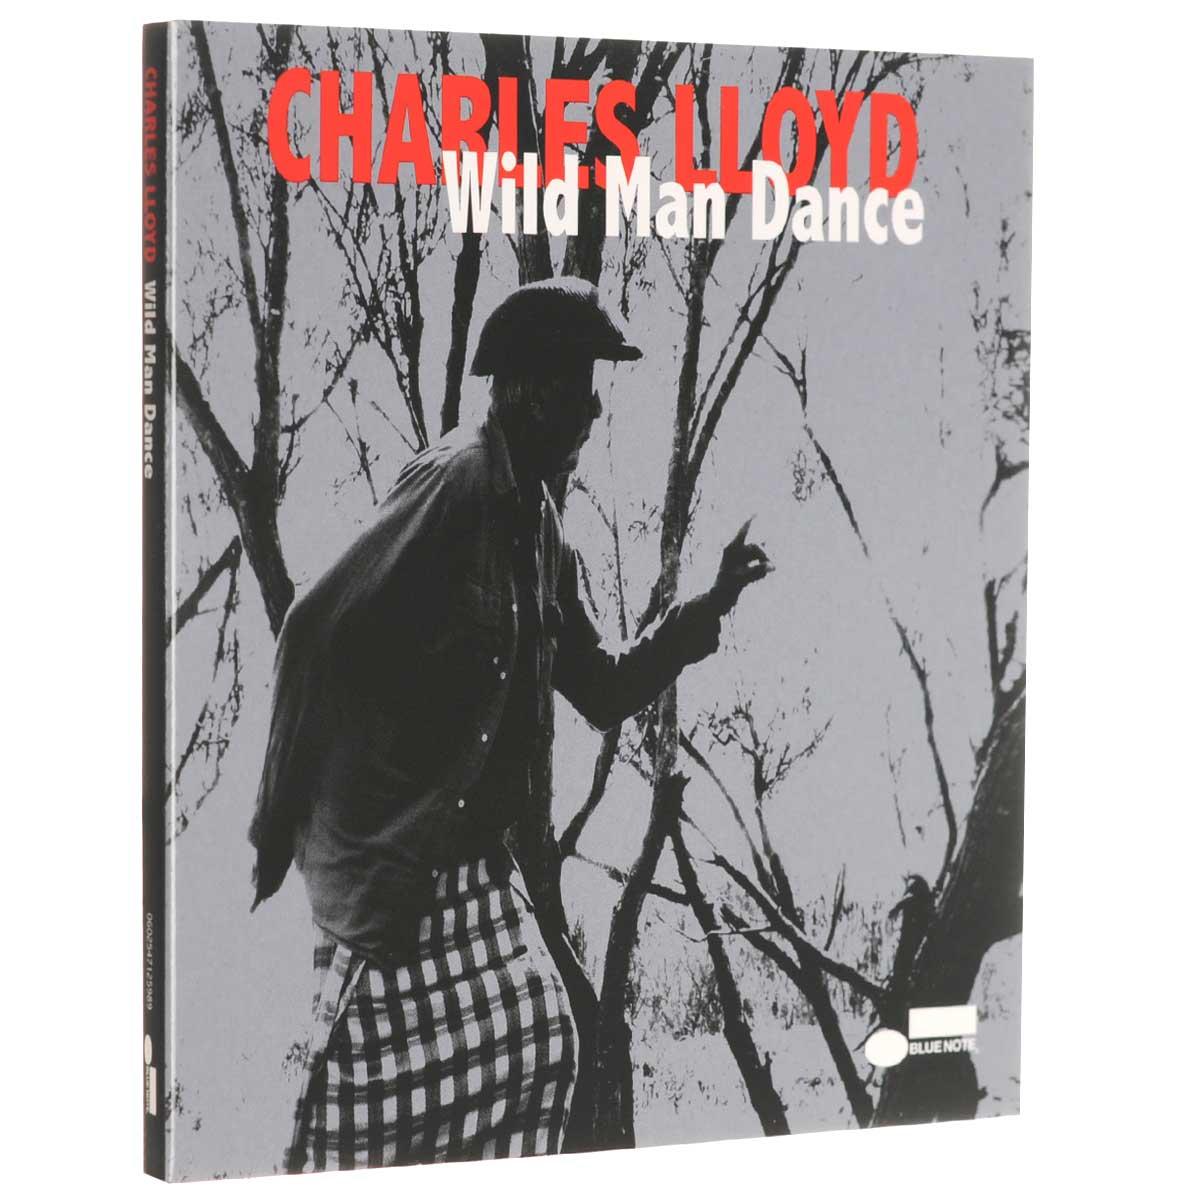 лучшая цена Чарльз Ллойд Charles Lloyd. Wild Man Dance